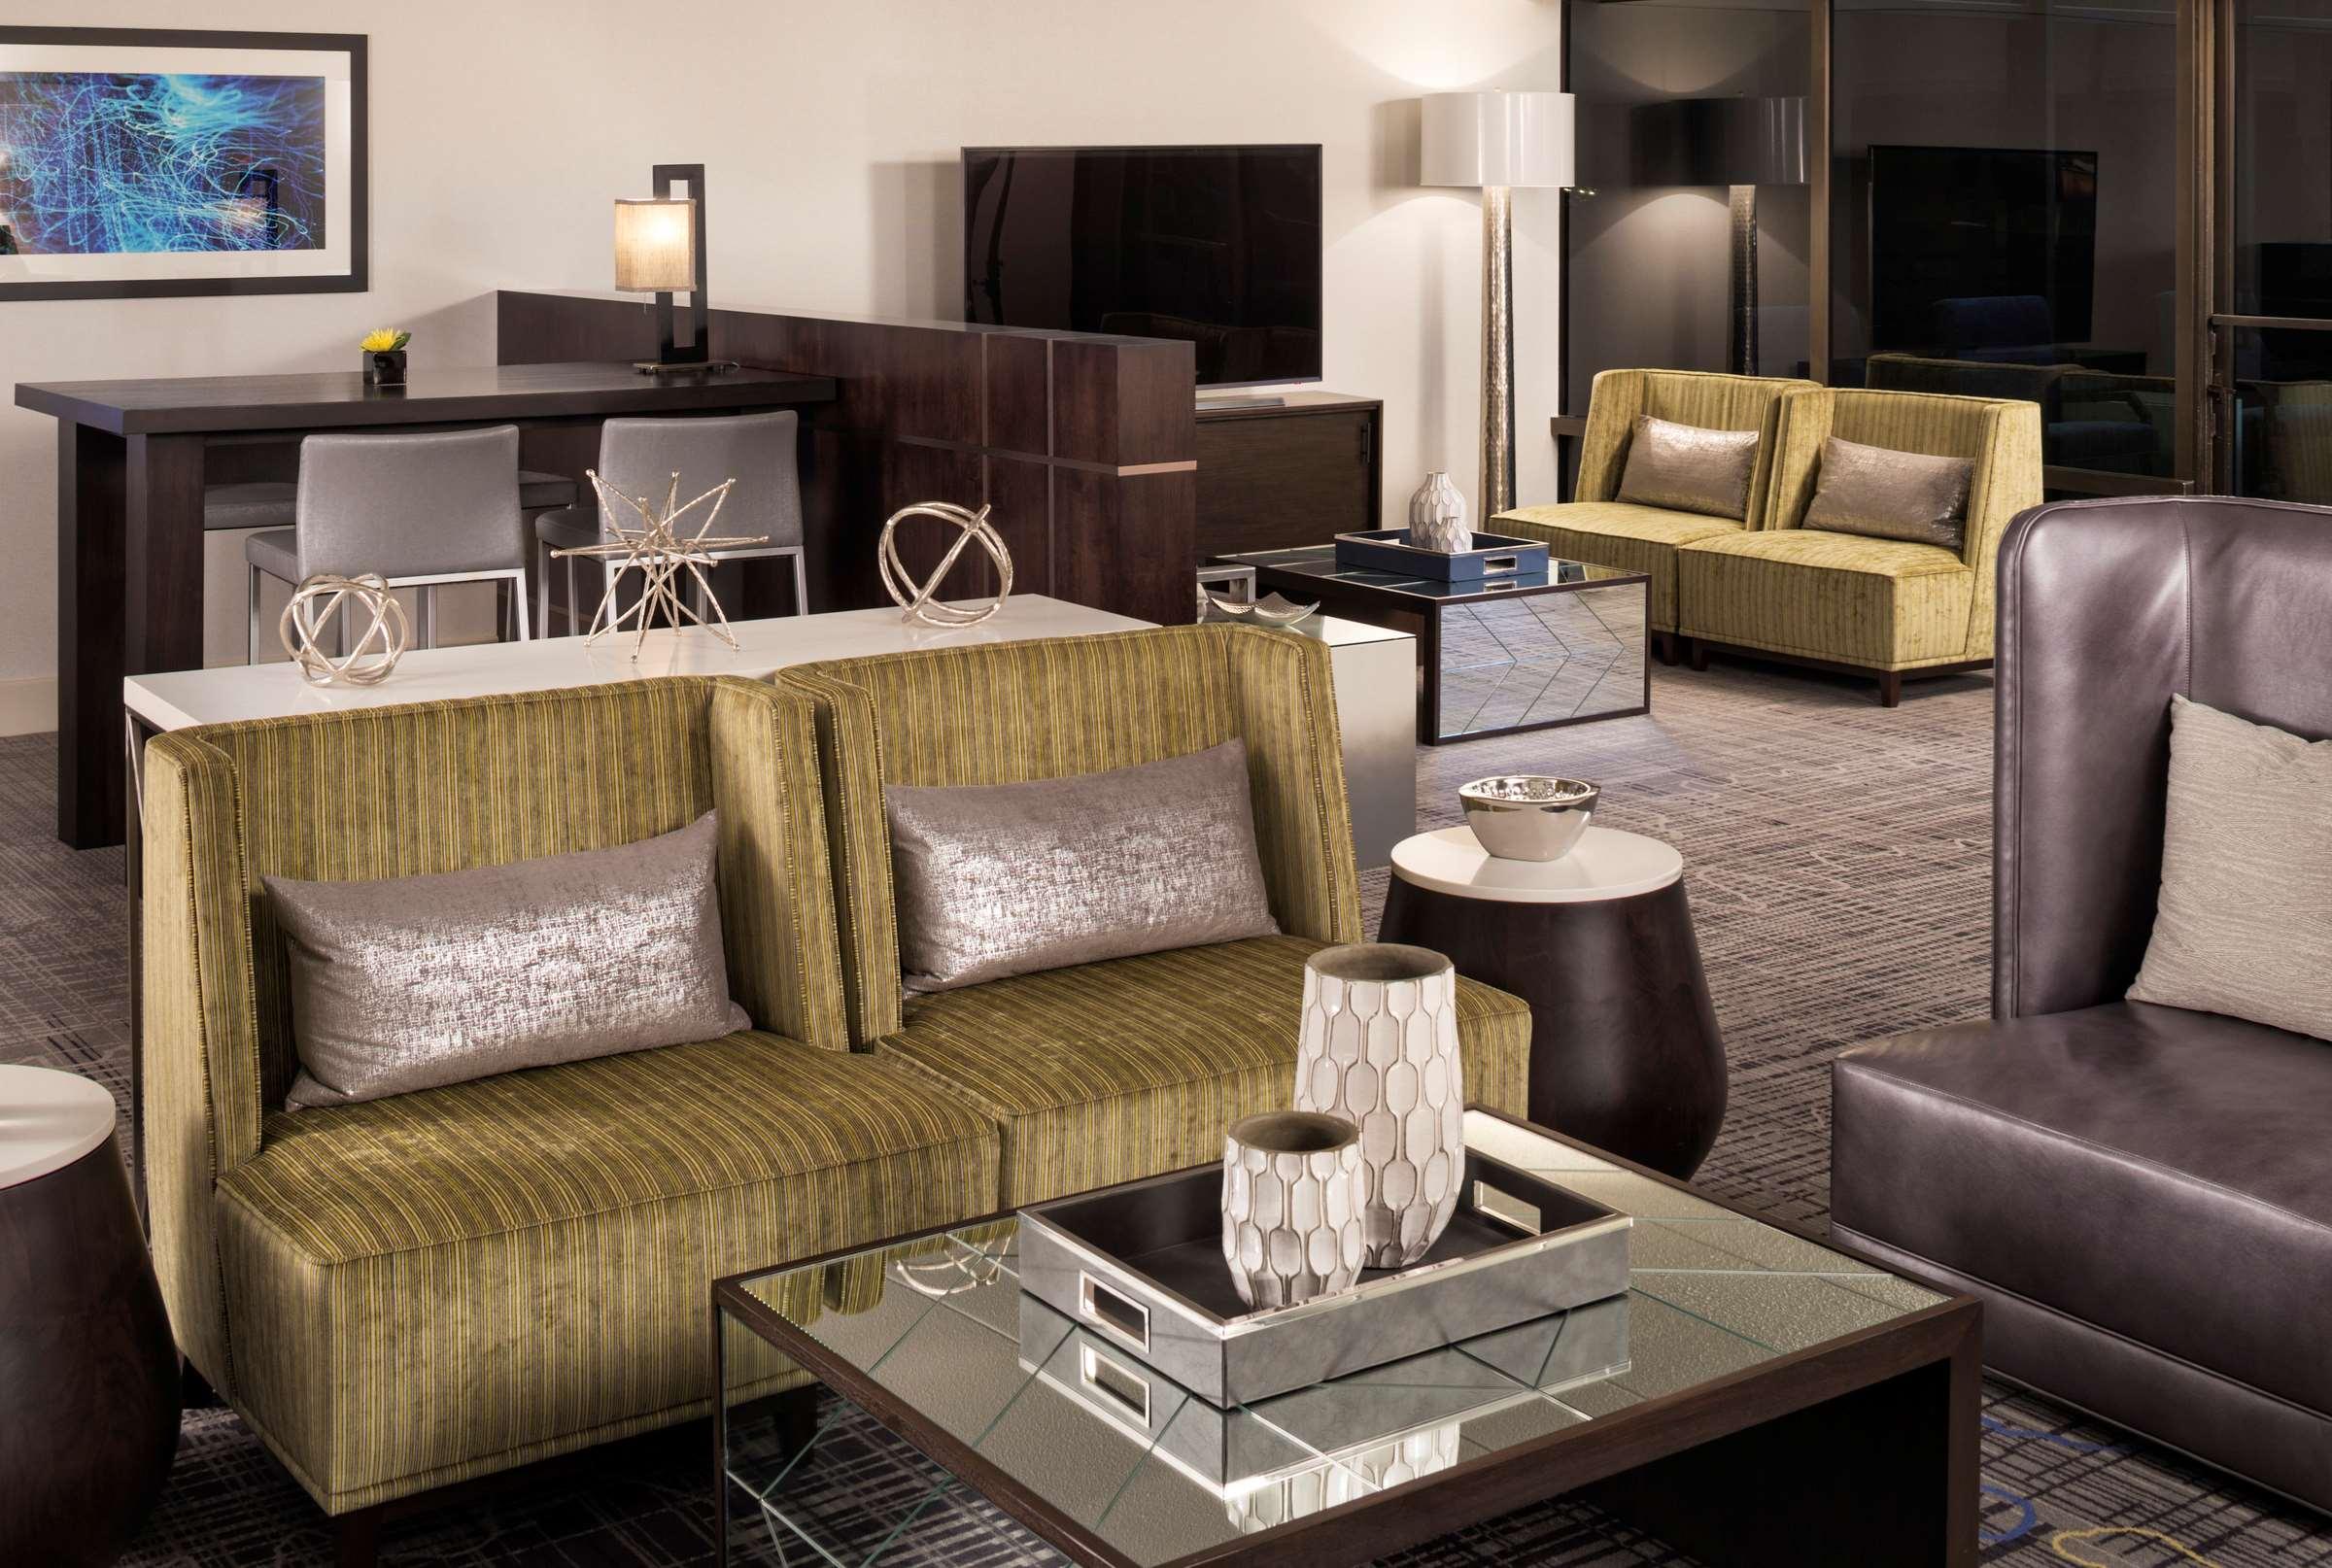 Sheraton Bloomington Hotel image 31